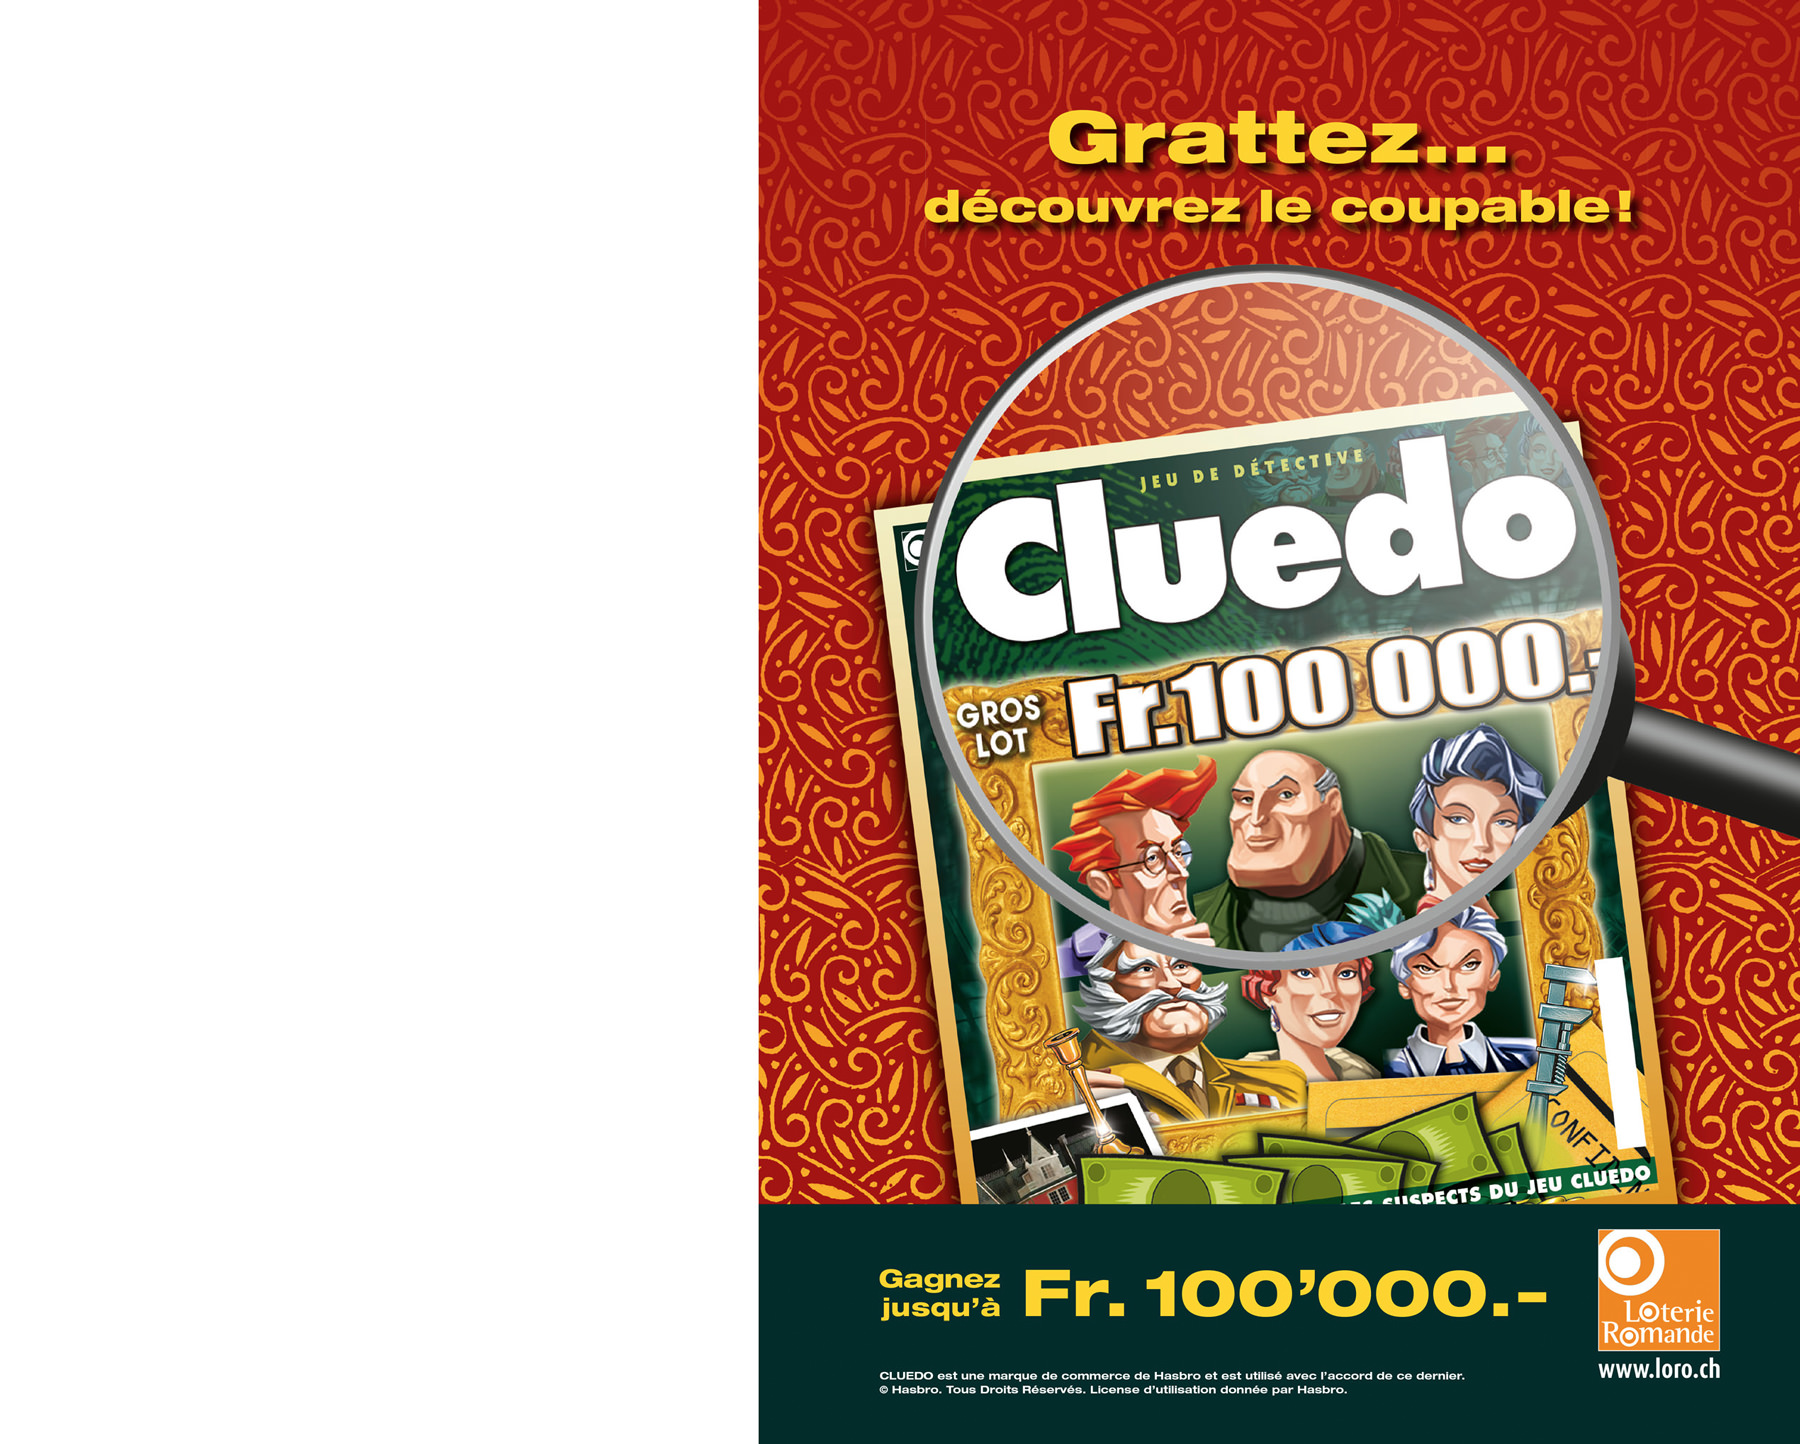 loterie_romande6